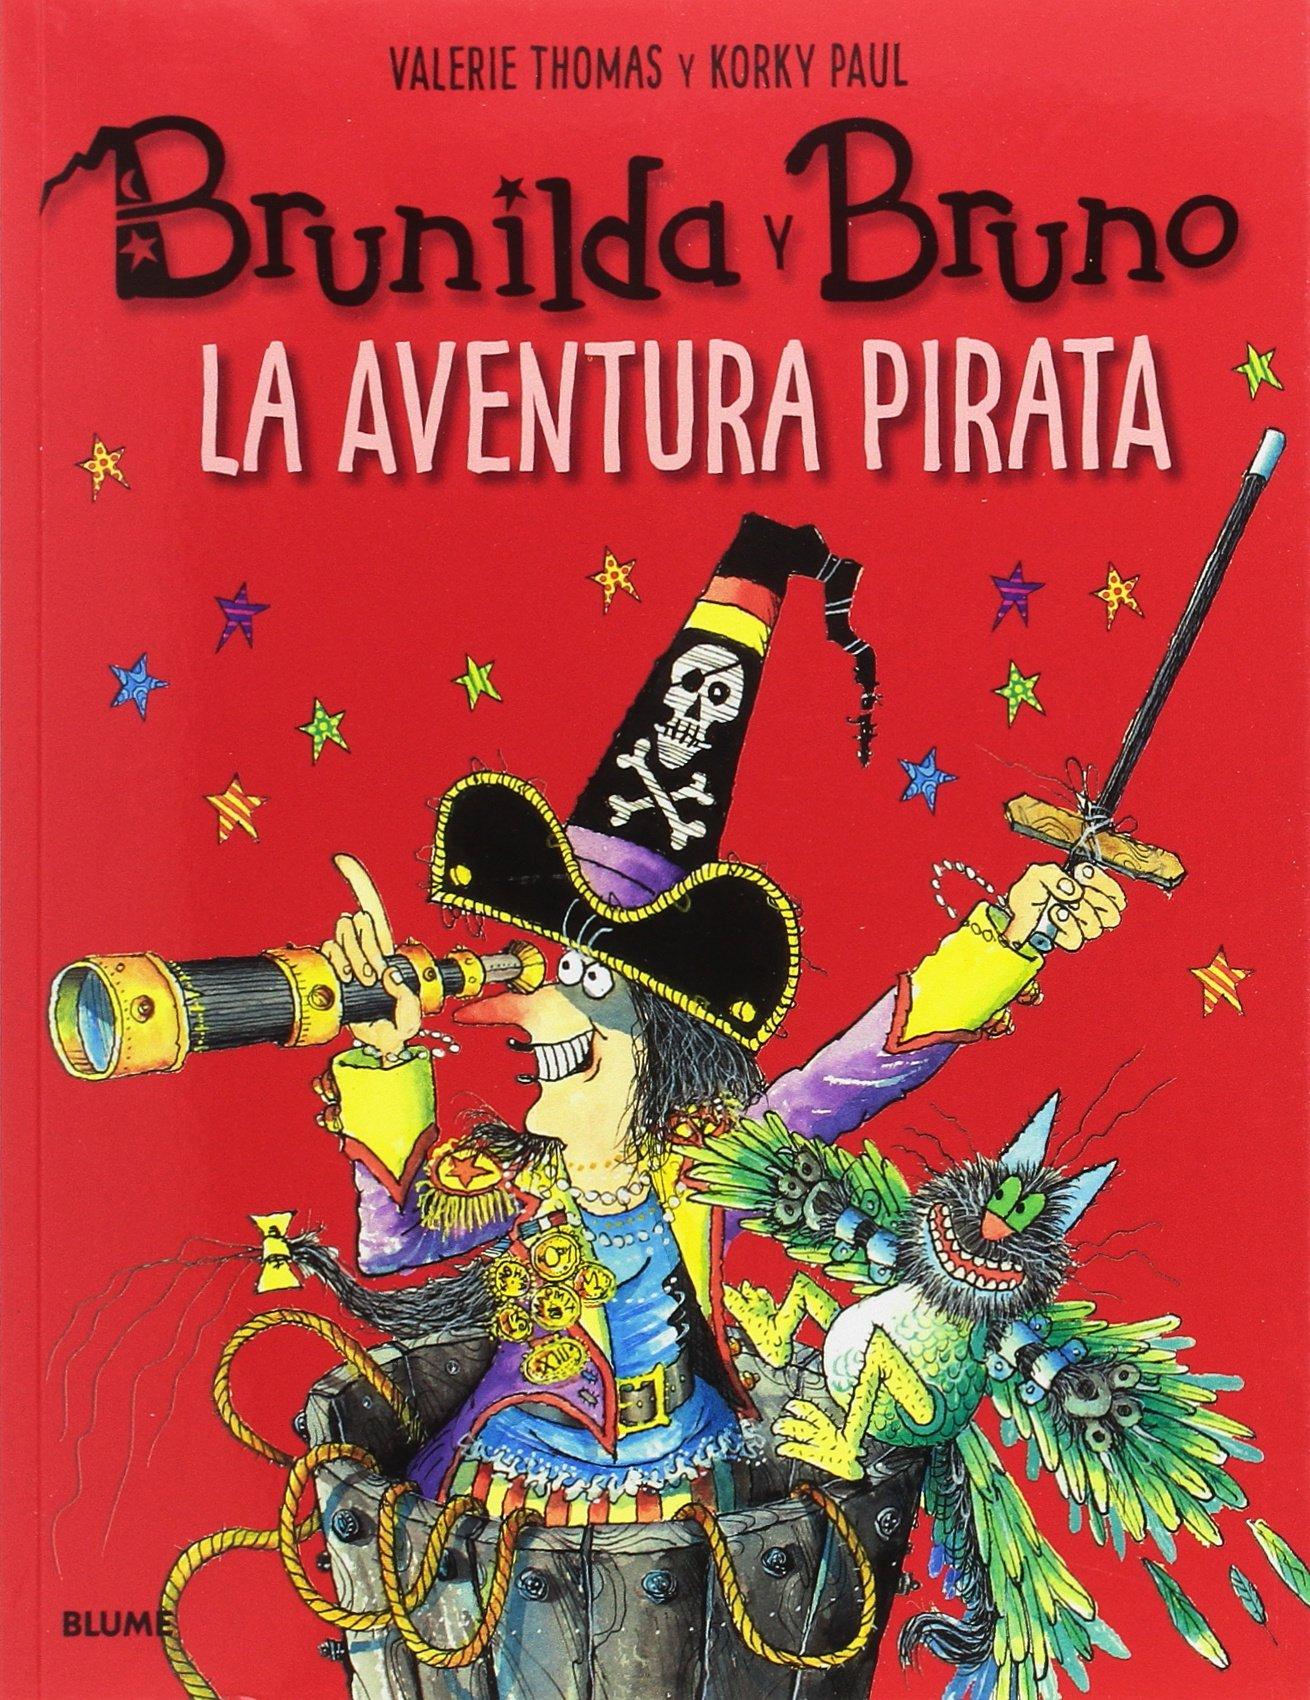 Brunilda y Bruno. La aventura pirata: Amazon.es: Thomas, Valerie, Paul, Korky, Rodríguez Fischer, Cristina, Diéguez Diéguez, Remedios: Libros